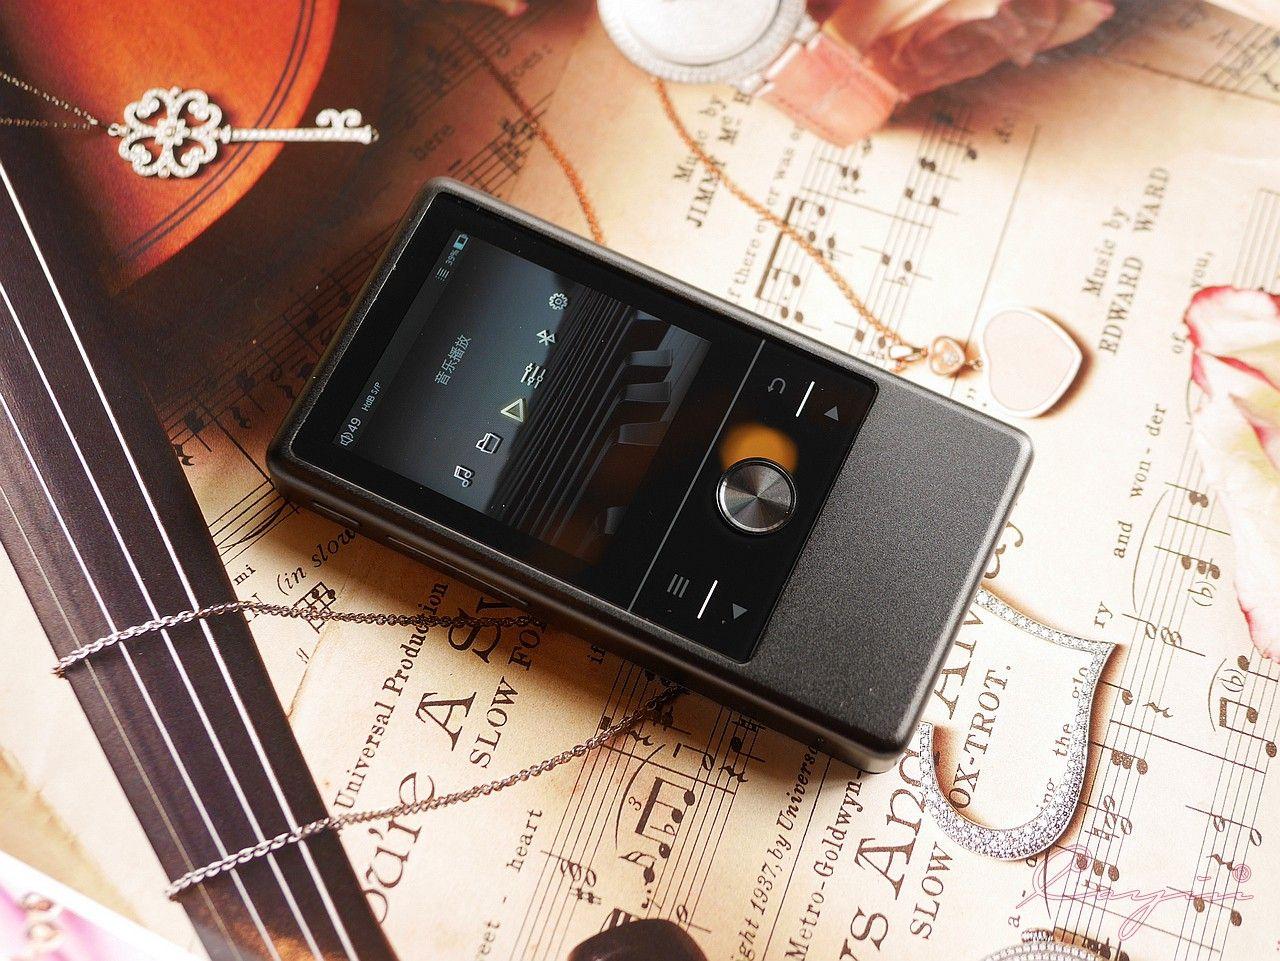 Cayin N3 Decoding Lossless DSD FLAC HiFi Music Portable MP3